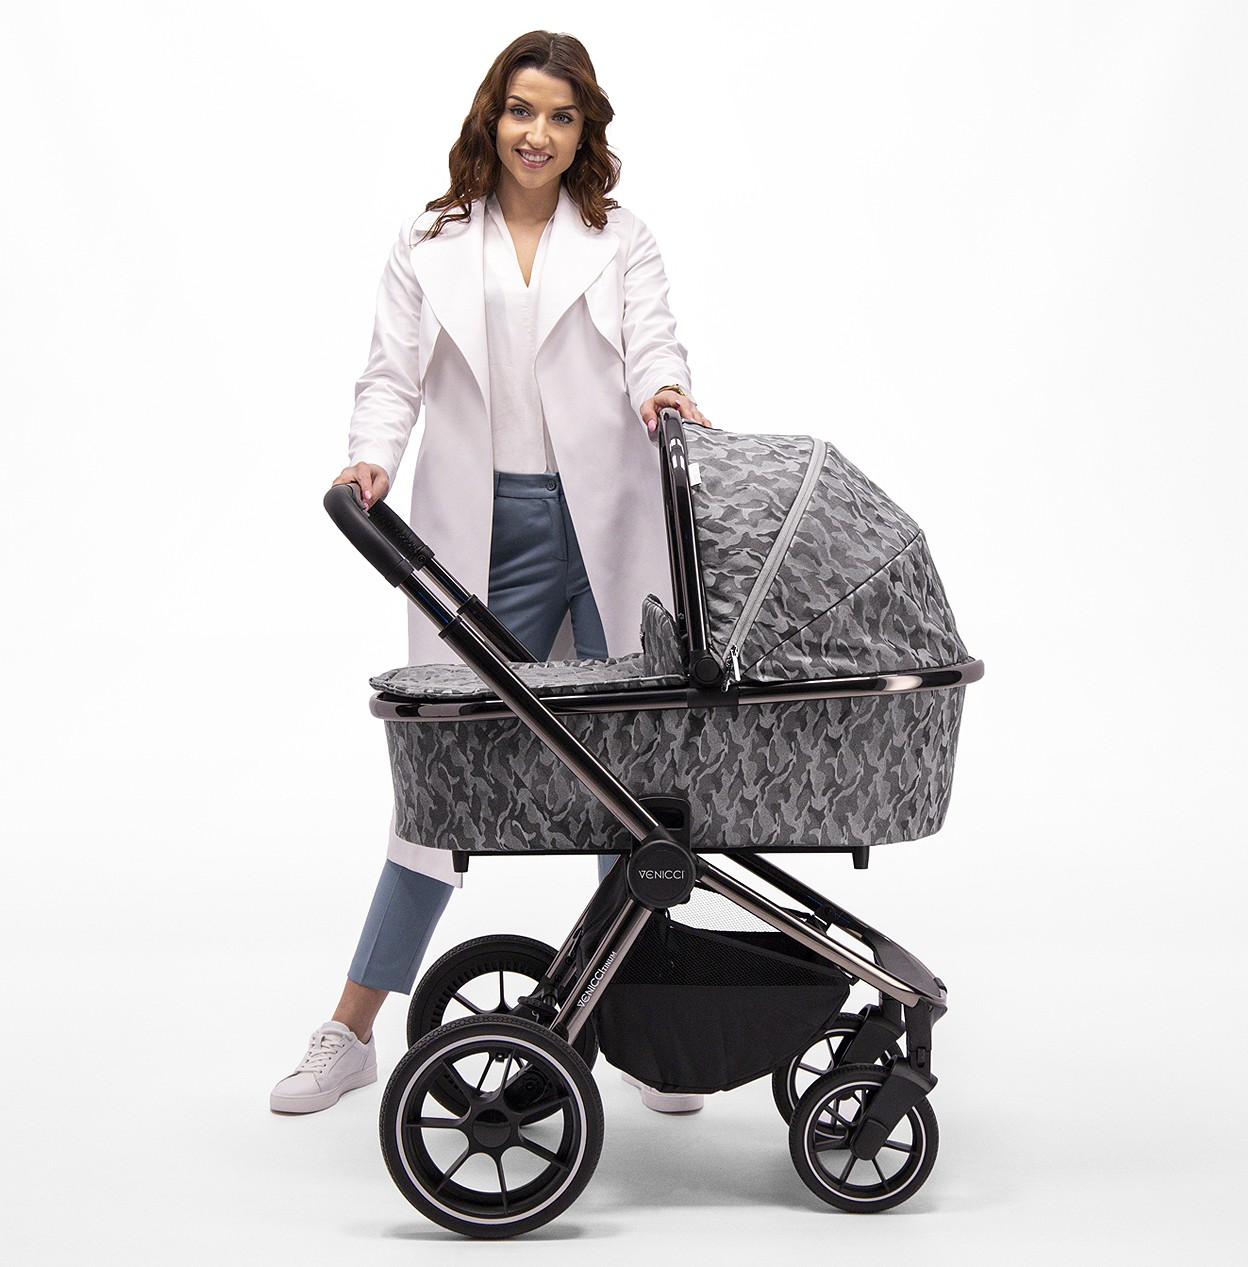 , Venicci – Your Baby's First Luxury Transport, Saubio Making Wealth